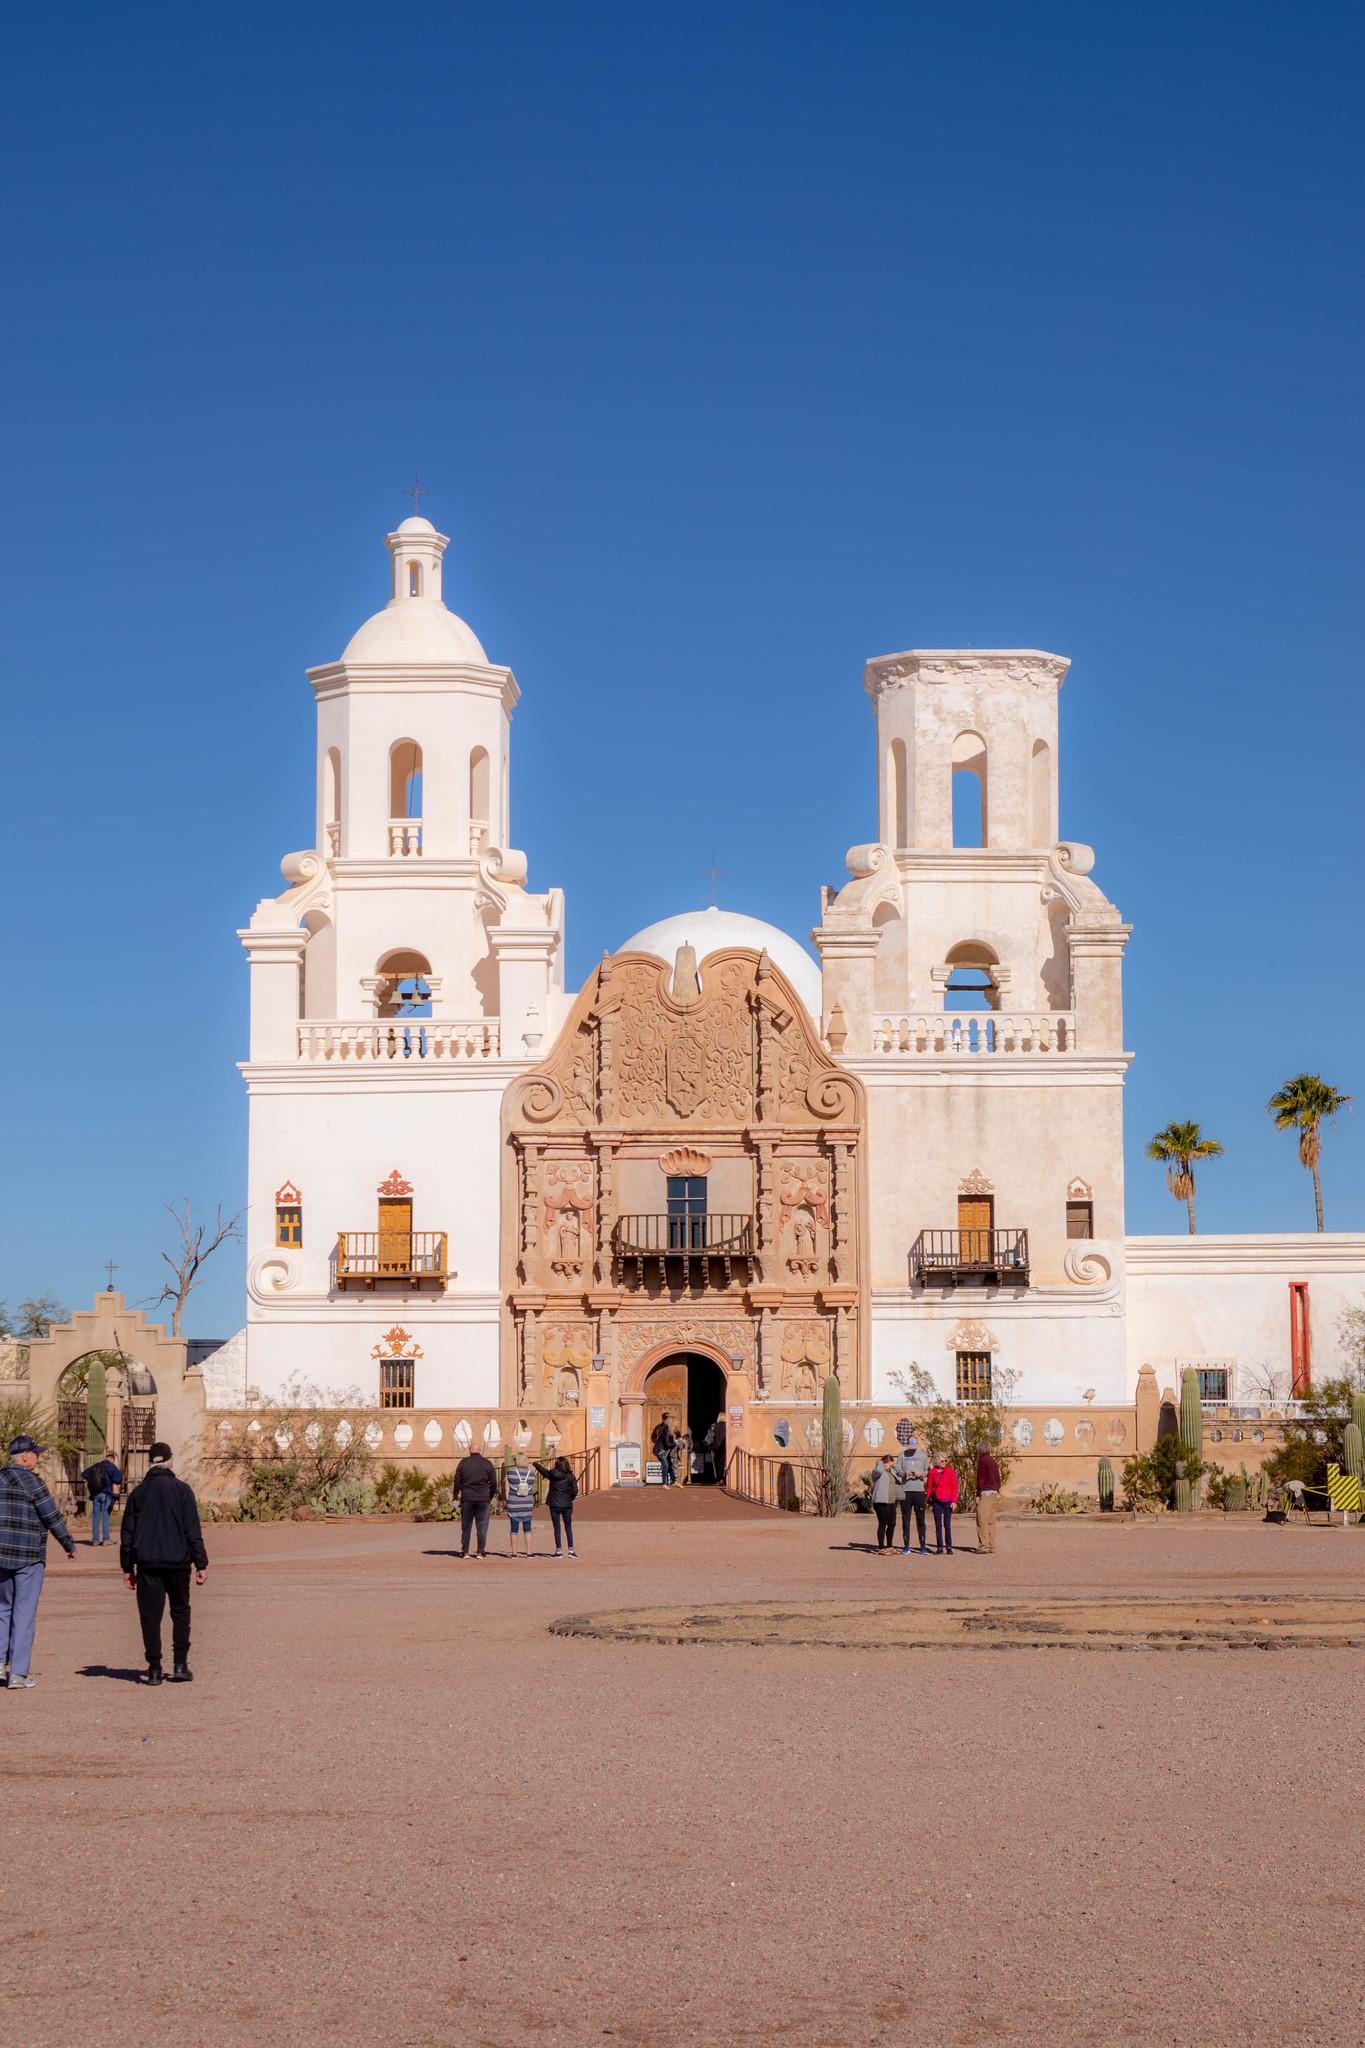 12.26. Mission San Xavier del Bac